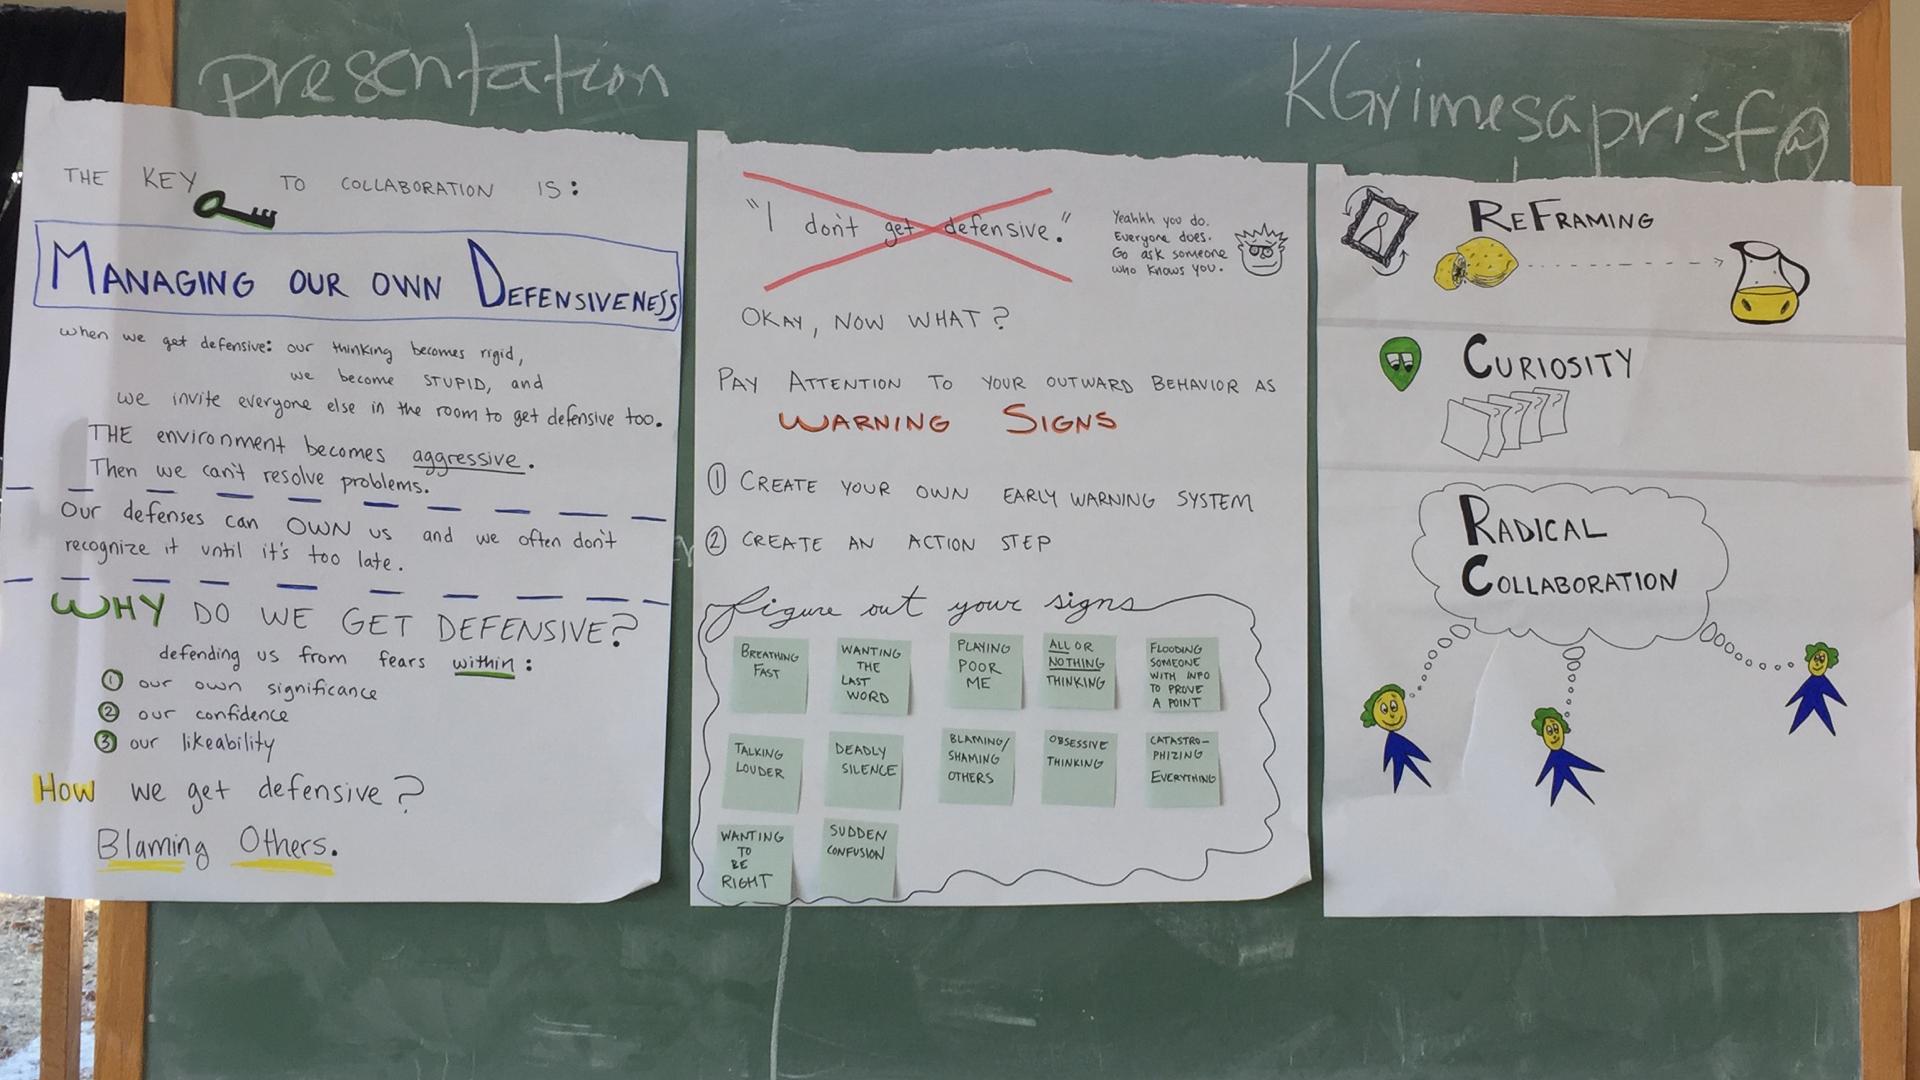 Workshop Three - Radical Collaboration